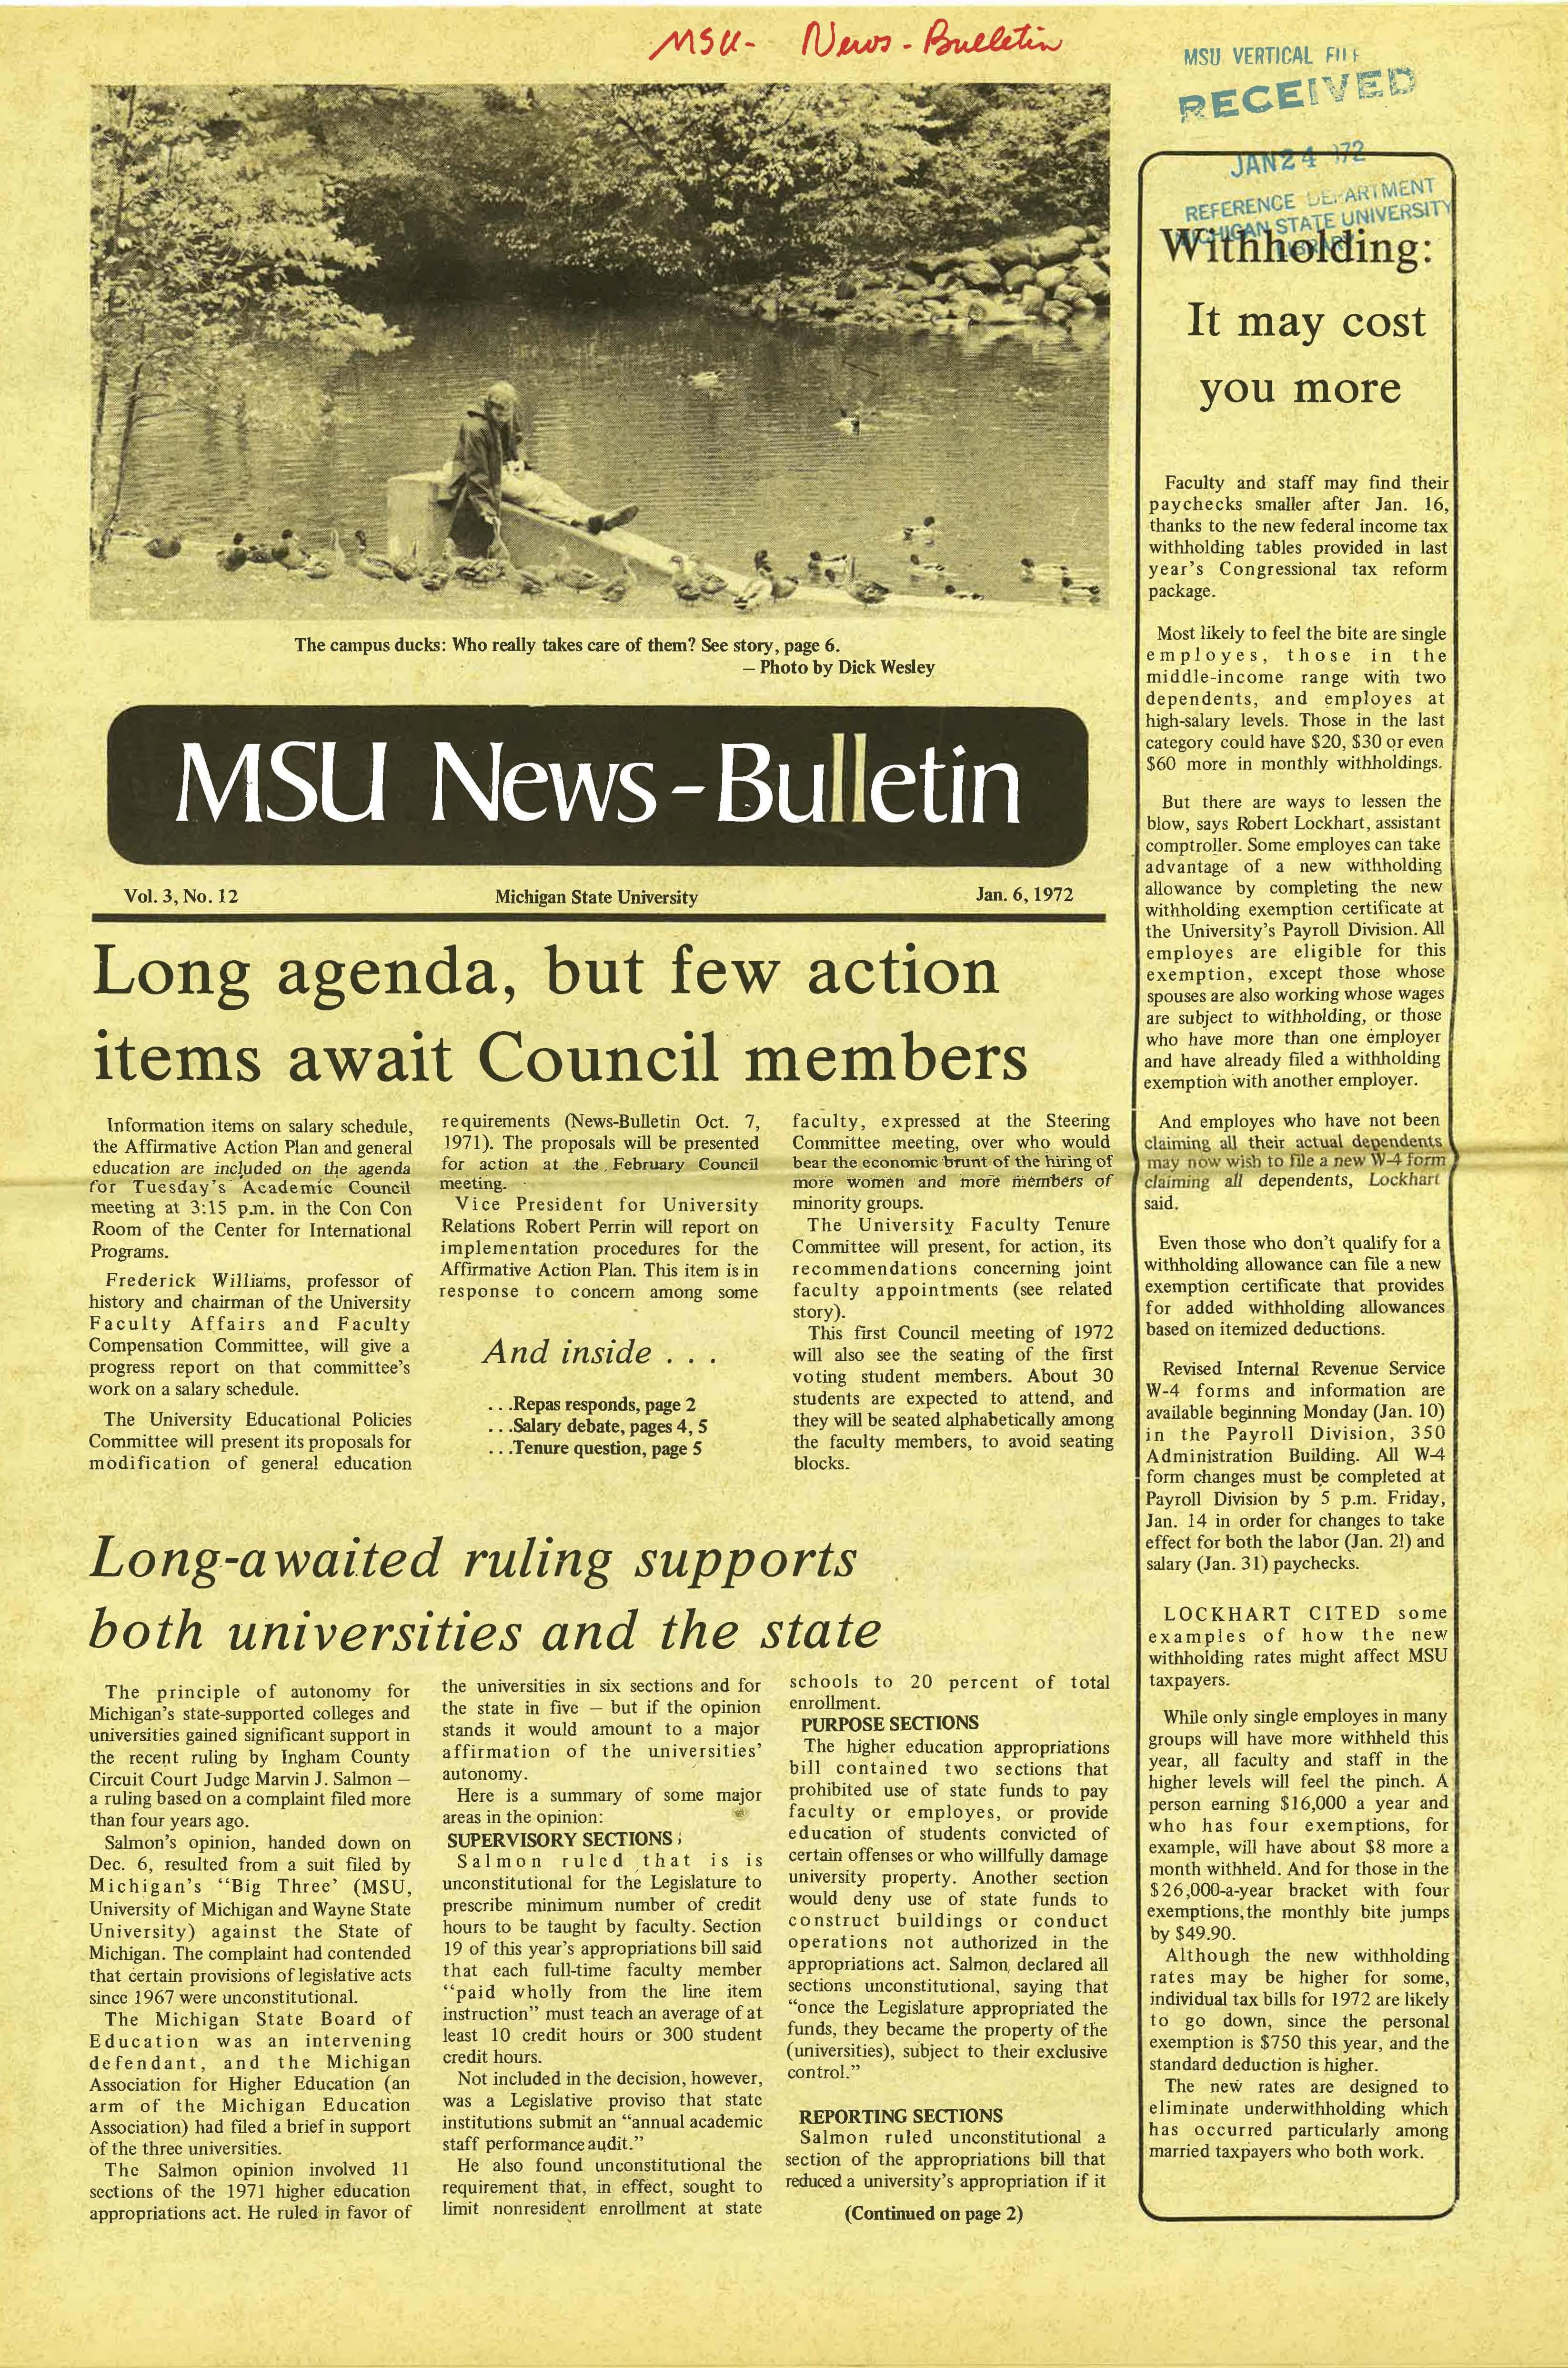 MSU News Bulletin, vol. 4, No. 08, November 9, 1972